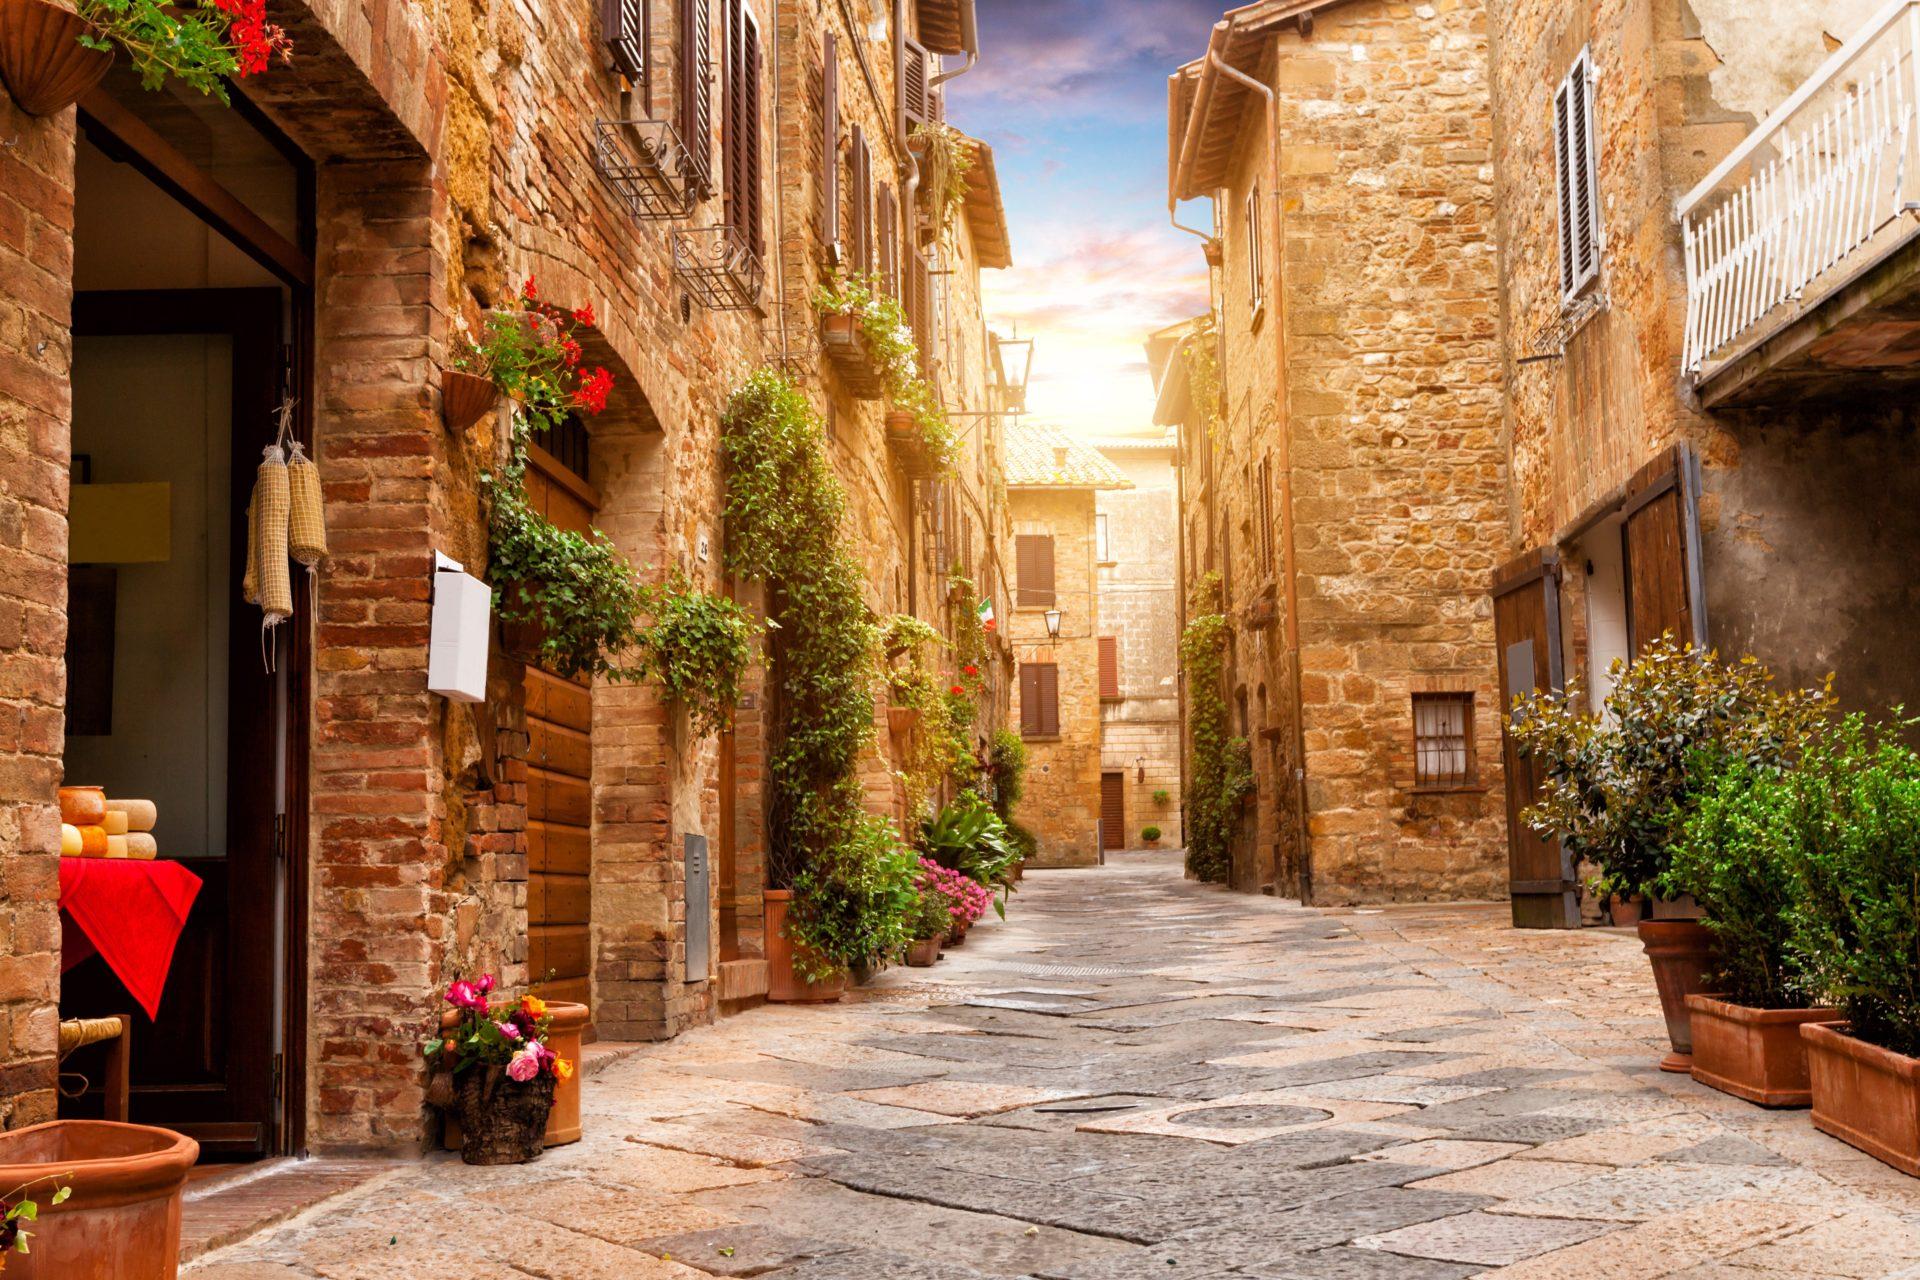 ITALY Street Sign Italian flag city country road wall gift BOLOGNA